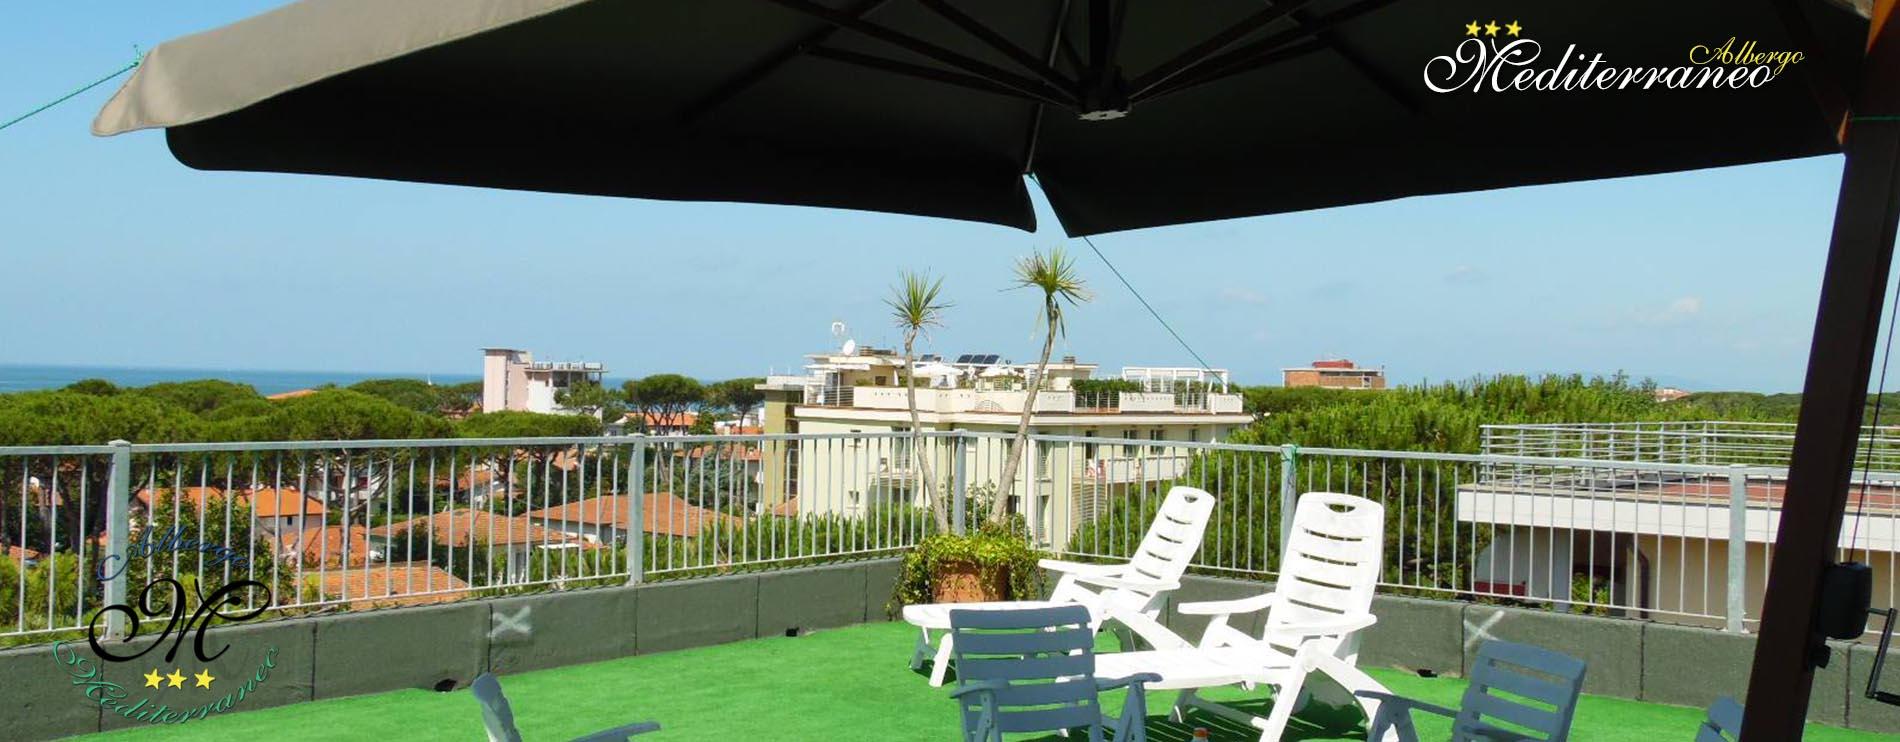 - offerte albergo versilia - offerte albergo marina di pietrasanta ...